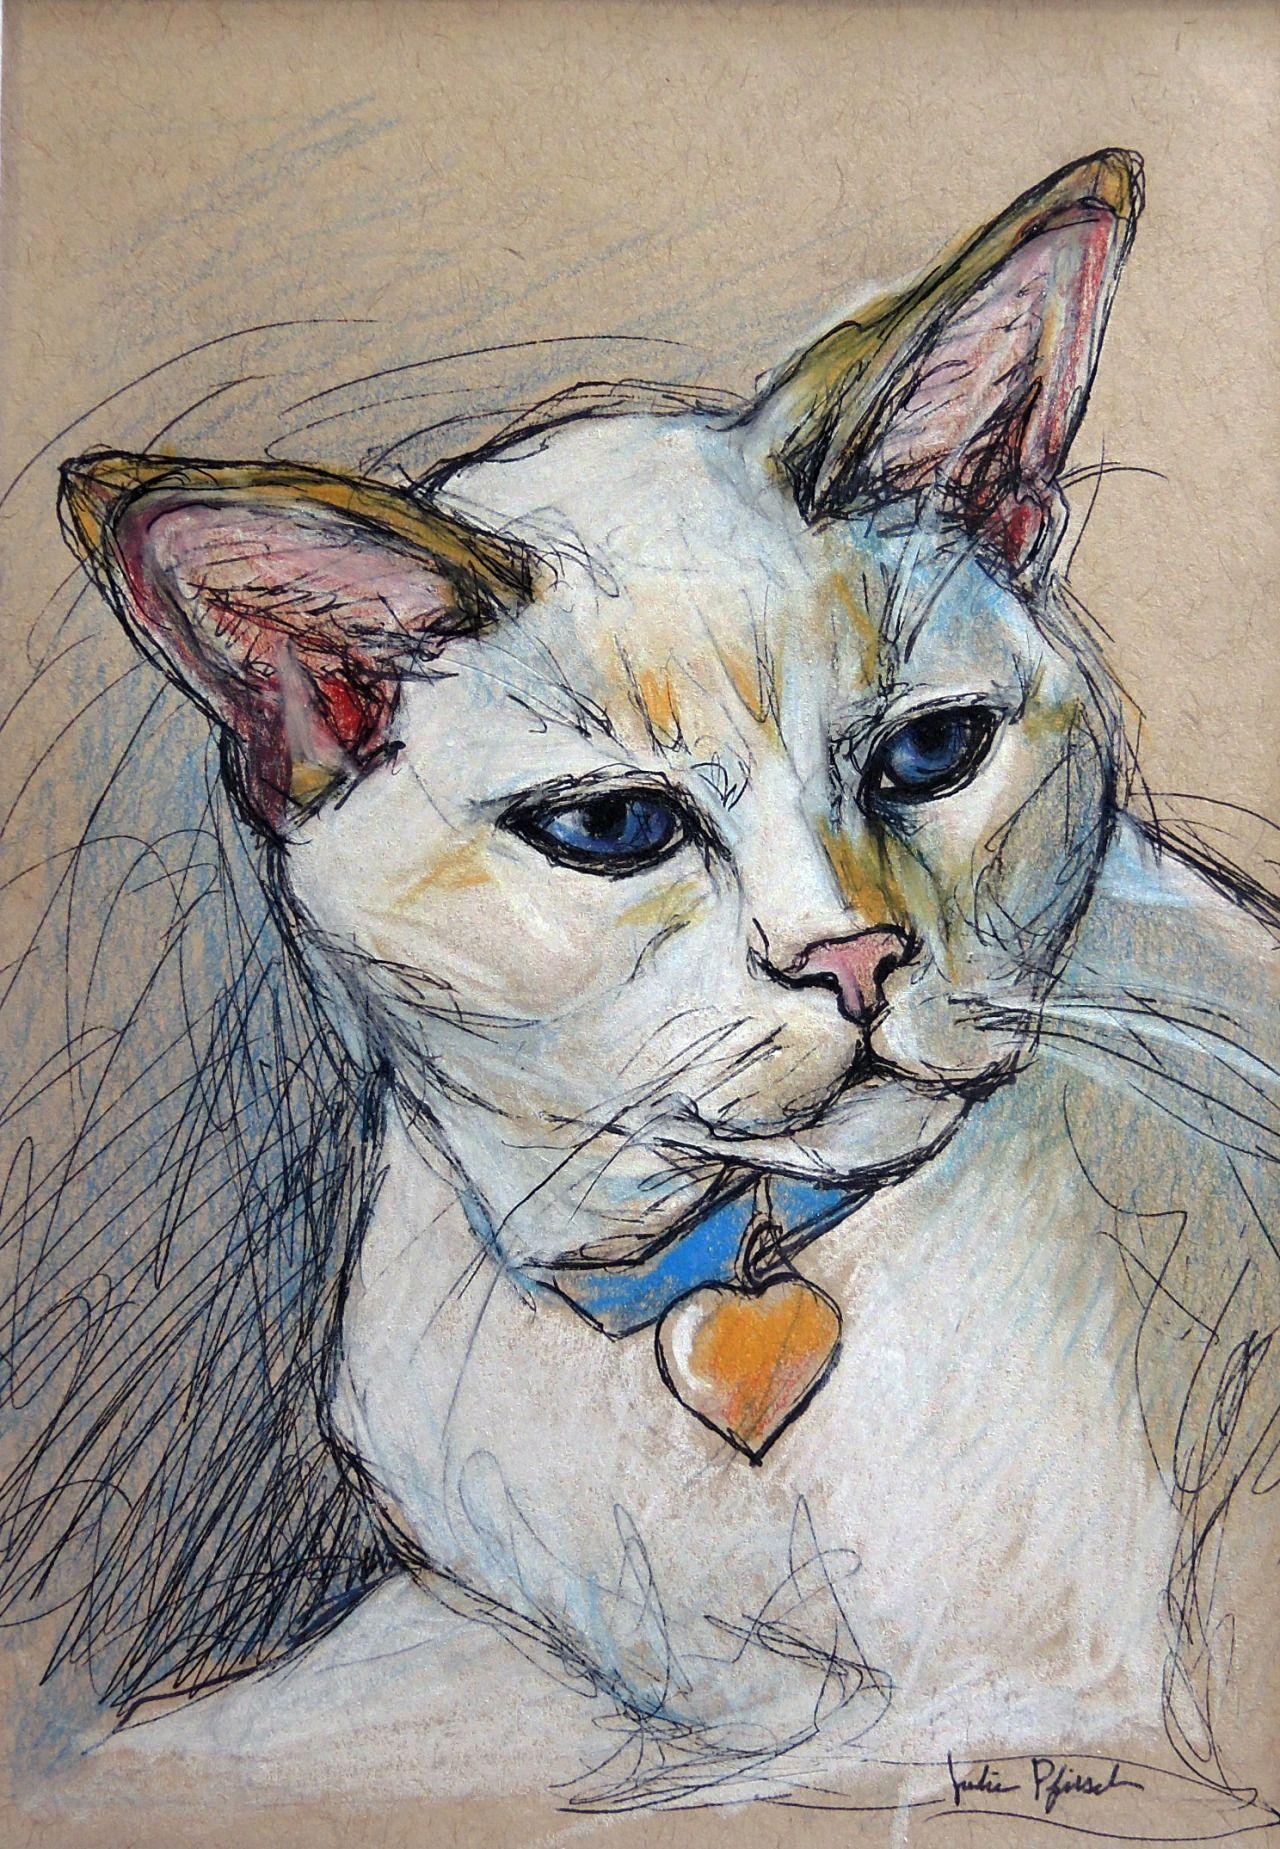 cat portrait expressive sketch in pen pencil and colored pencil